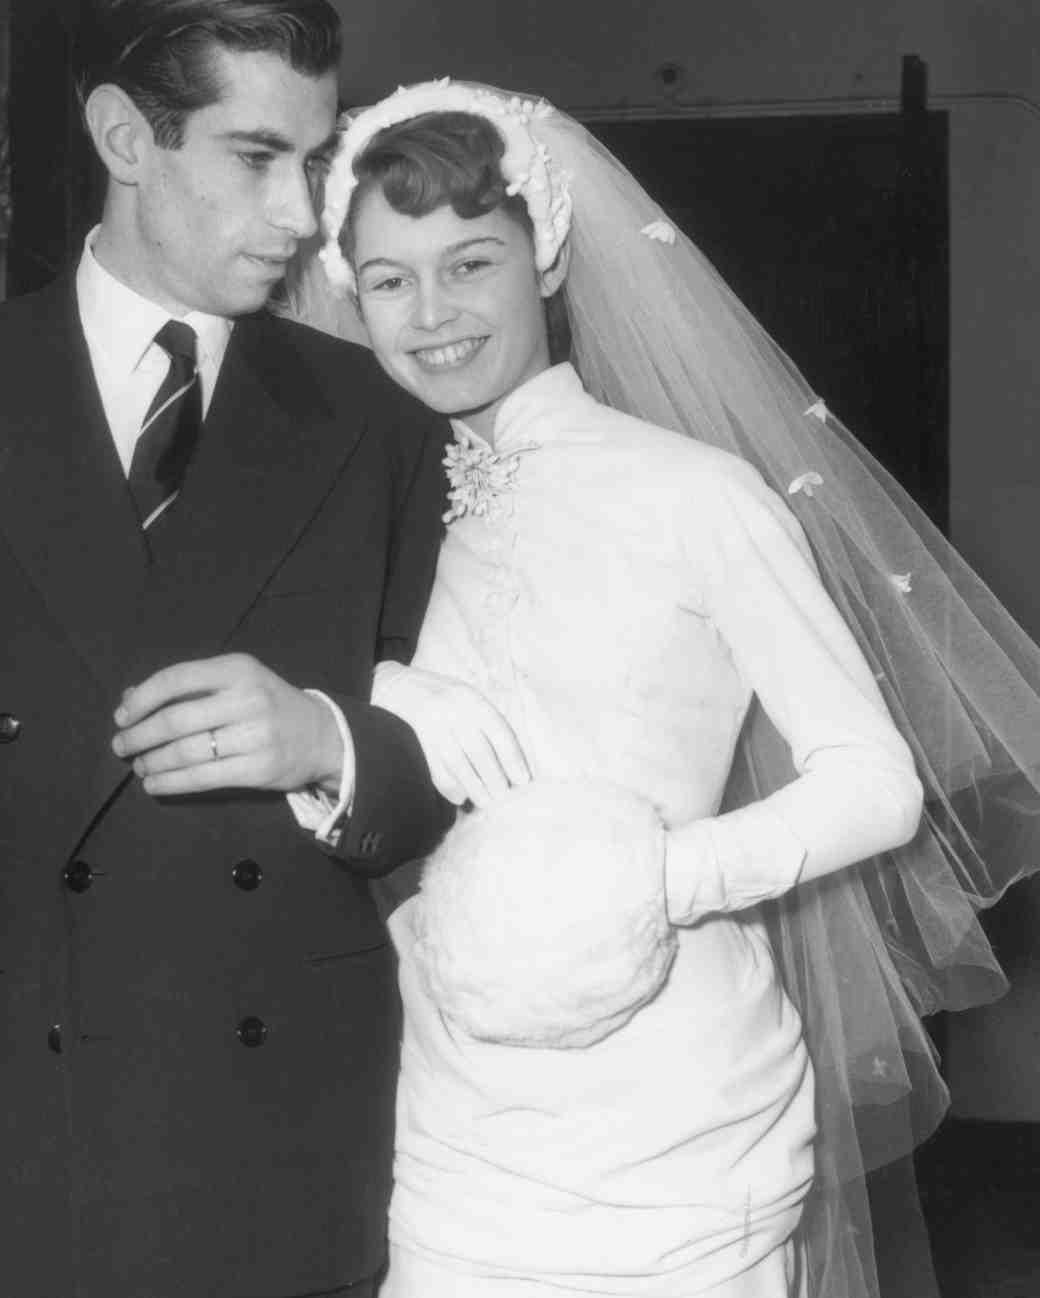 celebrity-brides-veils-brigitte-bardot-roger-vadim-0615.jpg